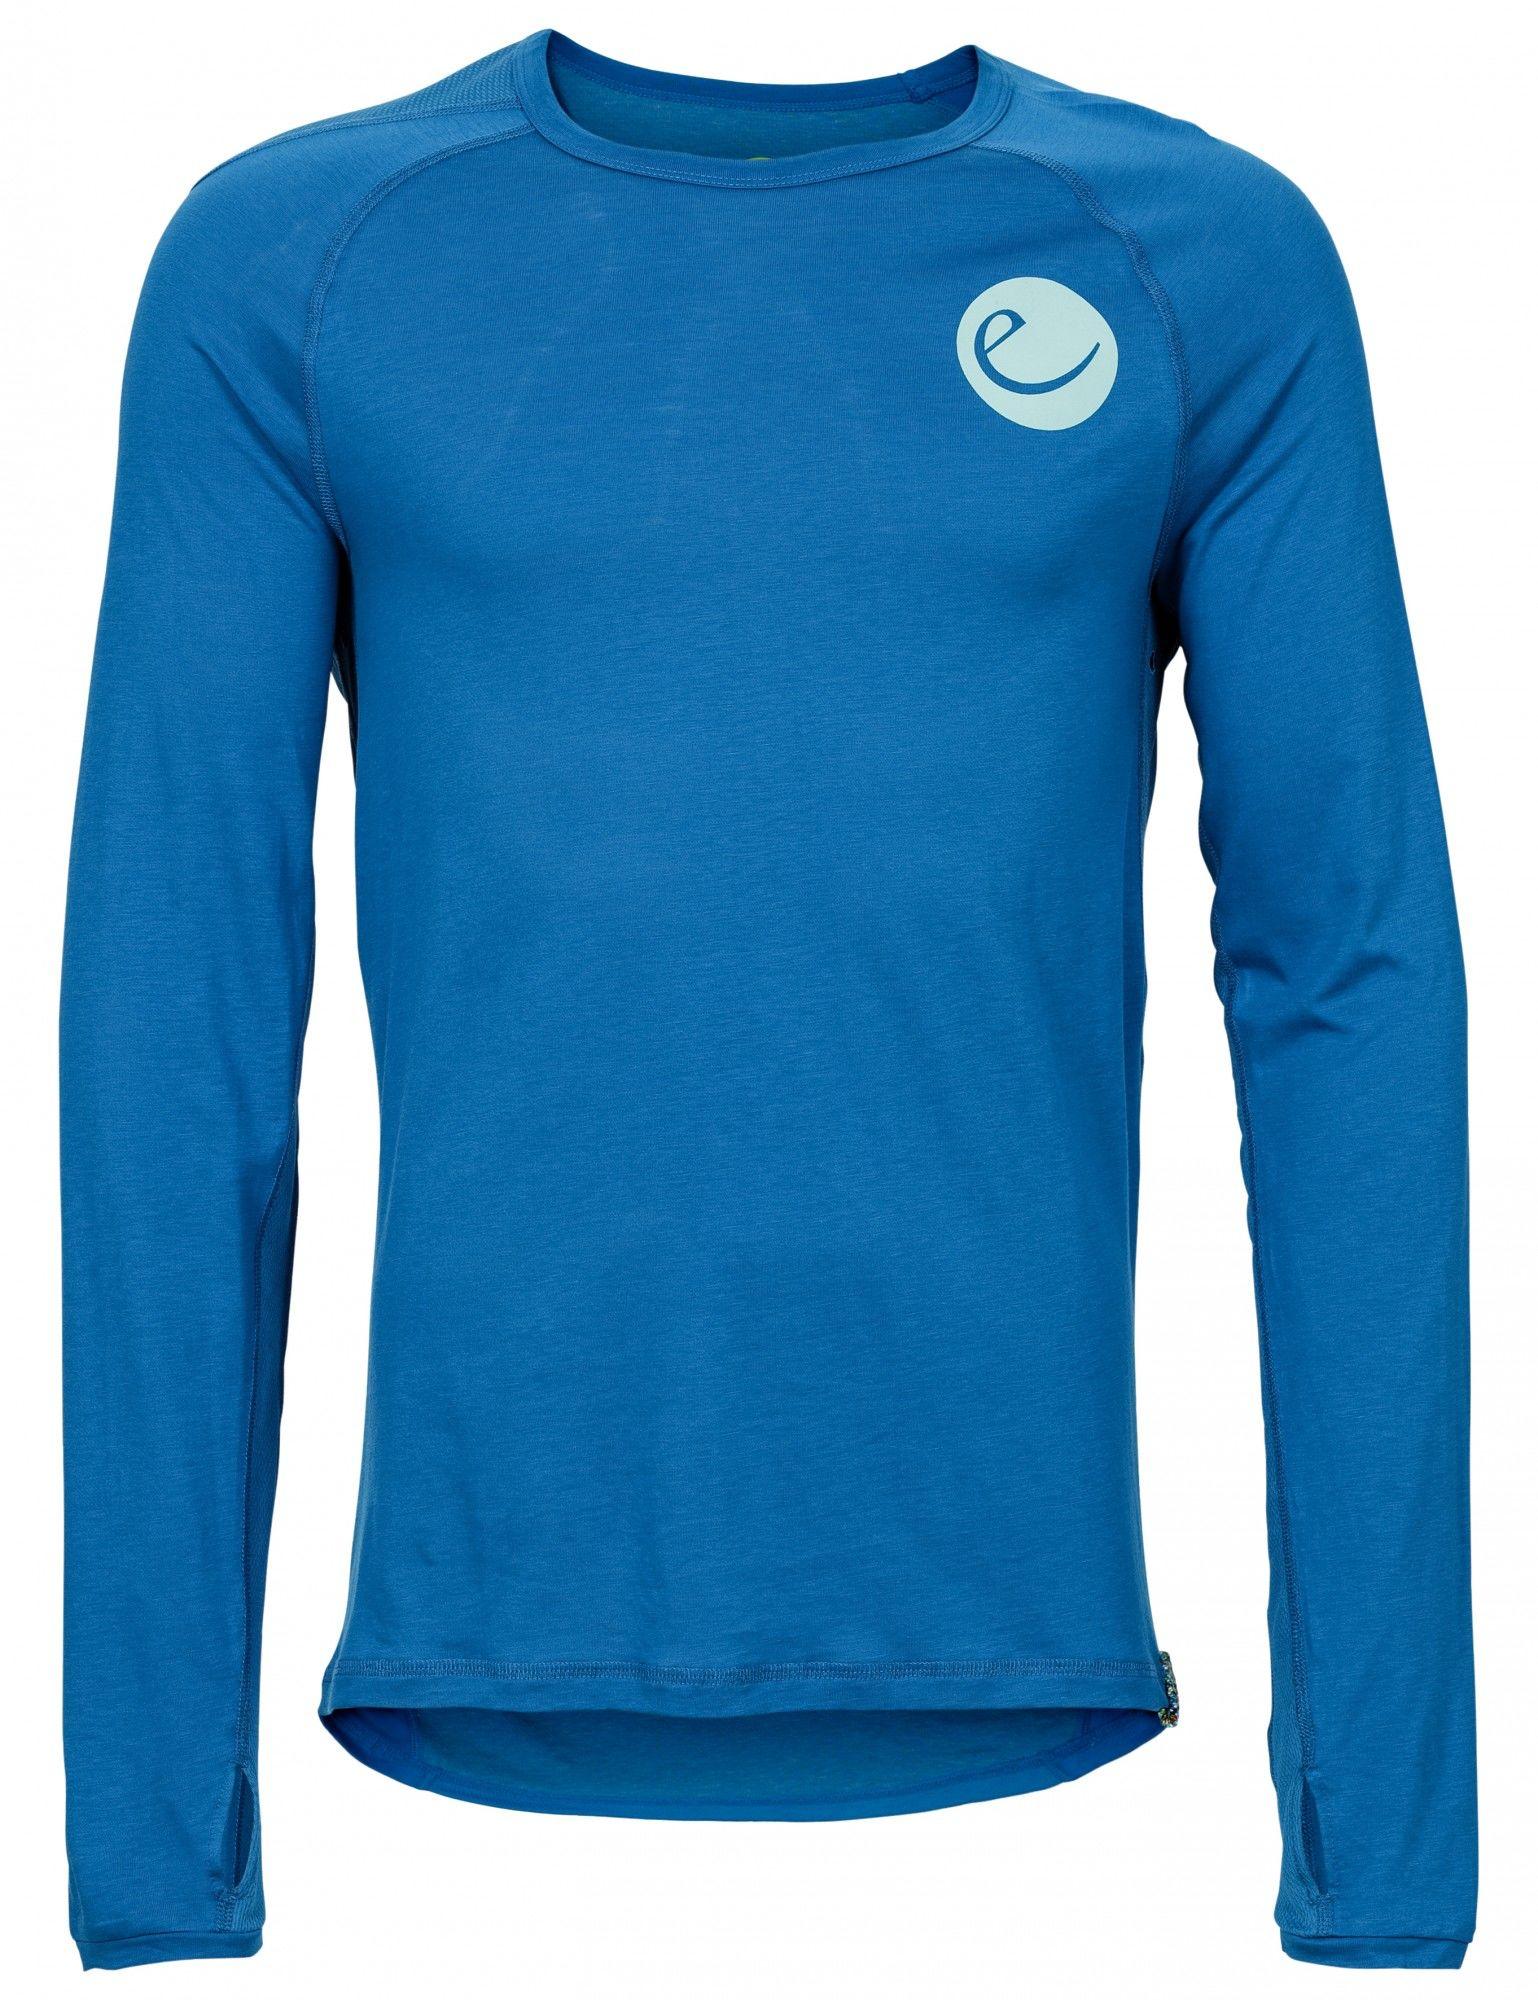 Edelrid Ascender Long-Sleeve Blau, Male Langarm-Shirt, XL